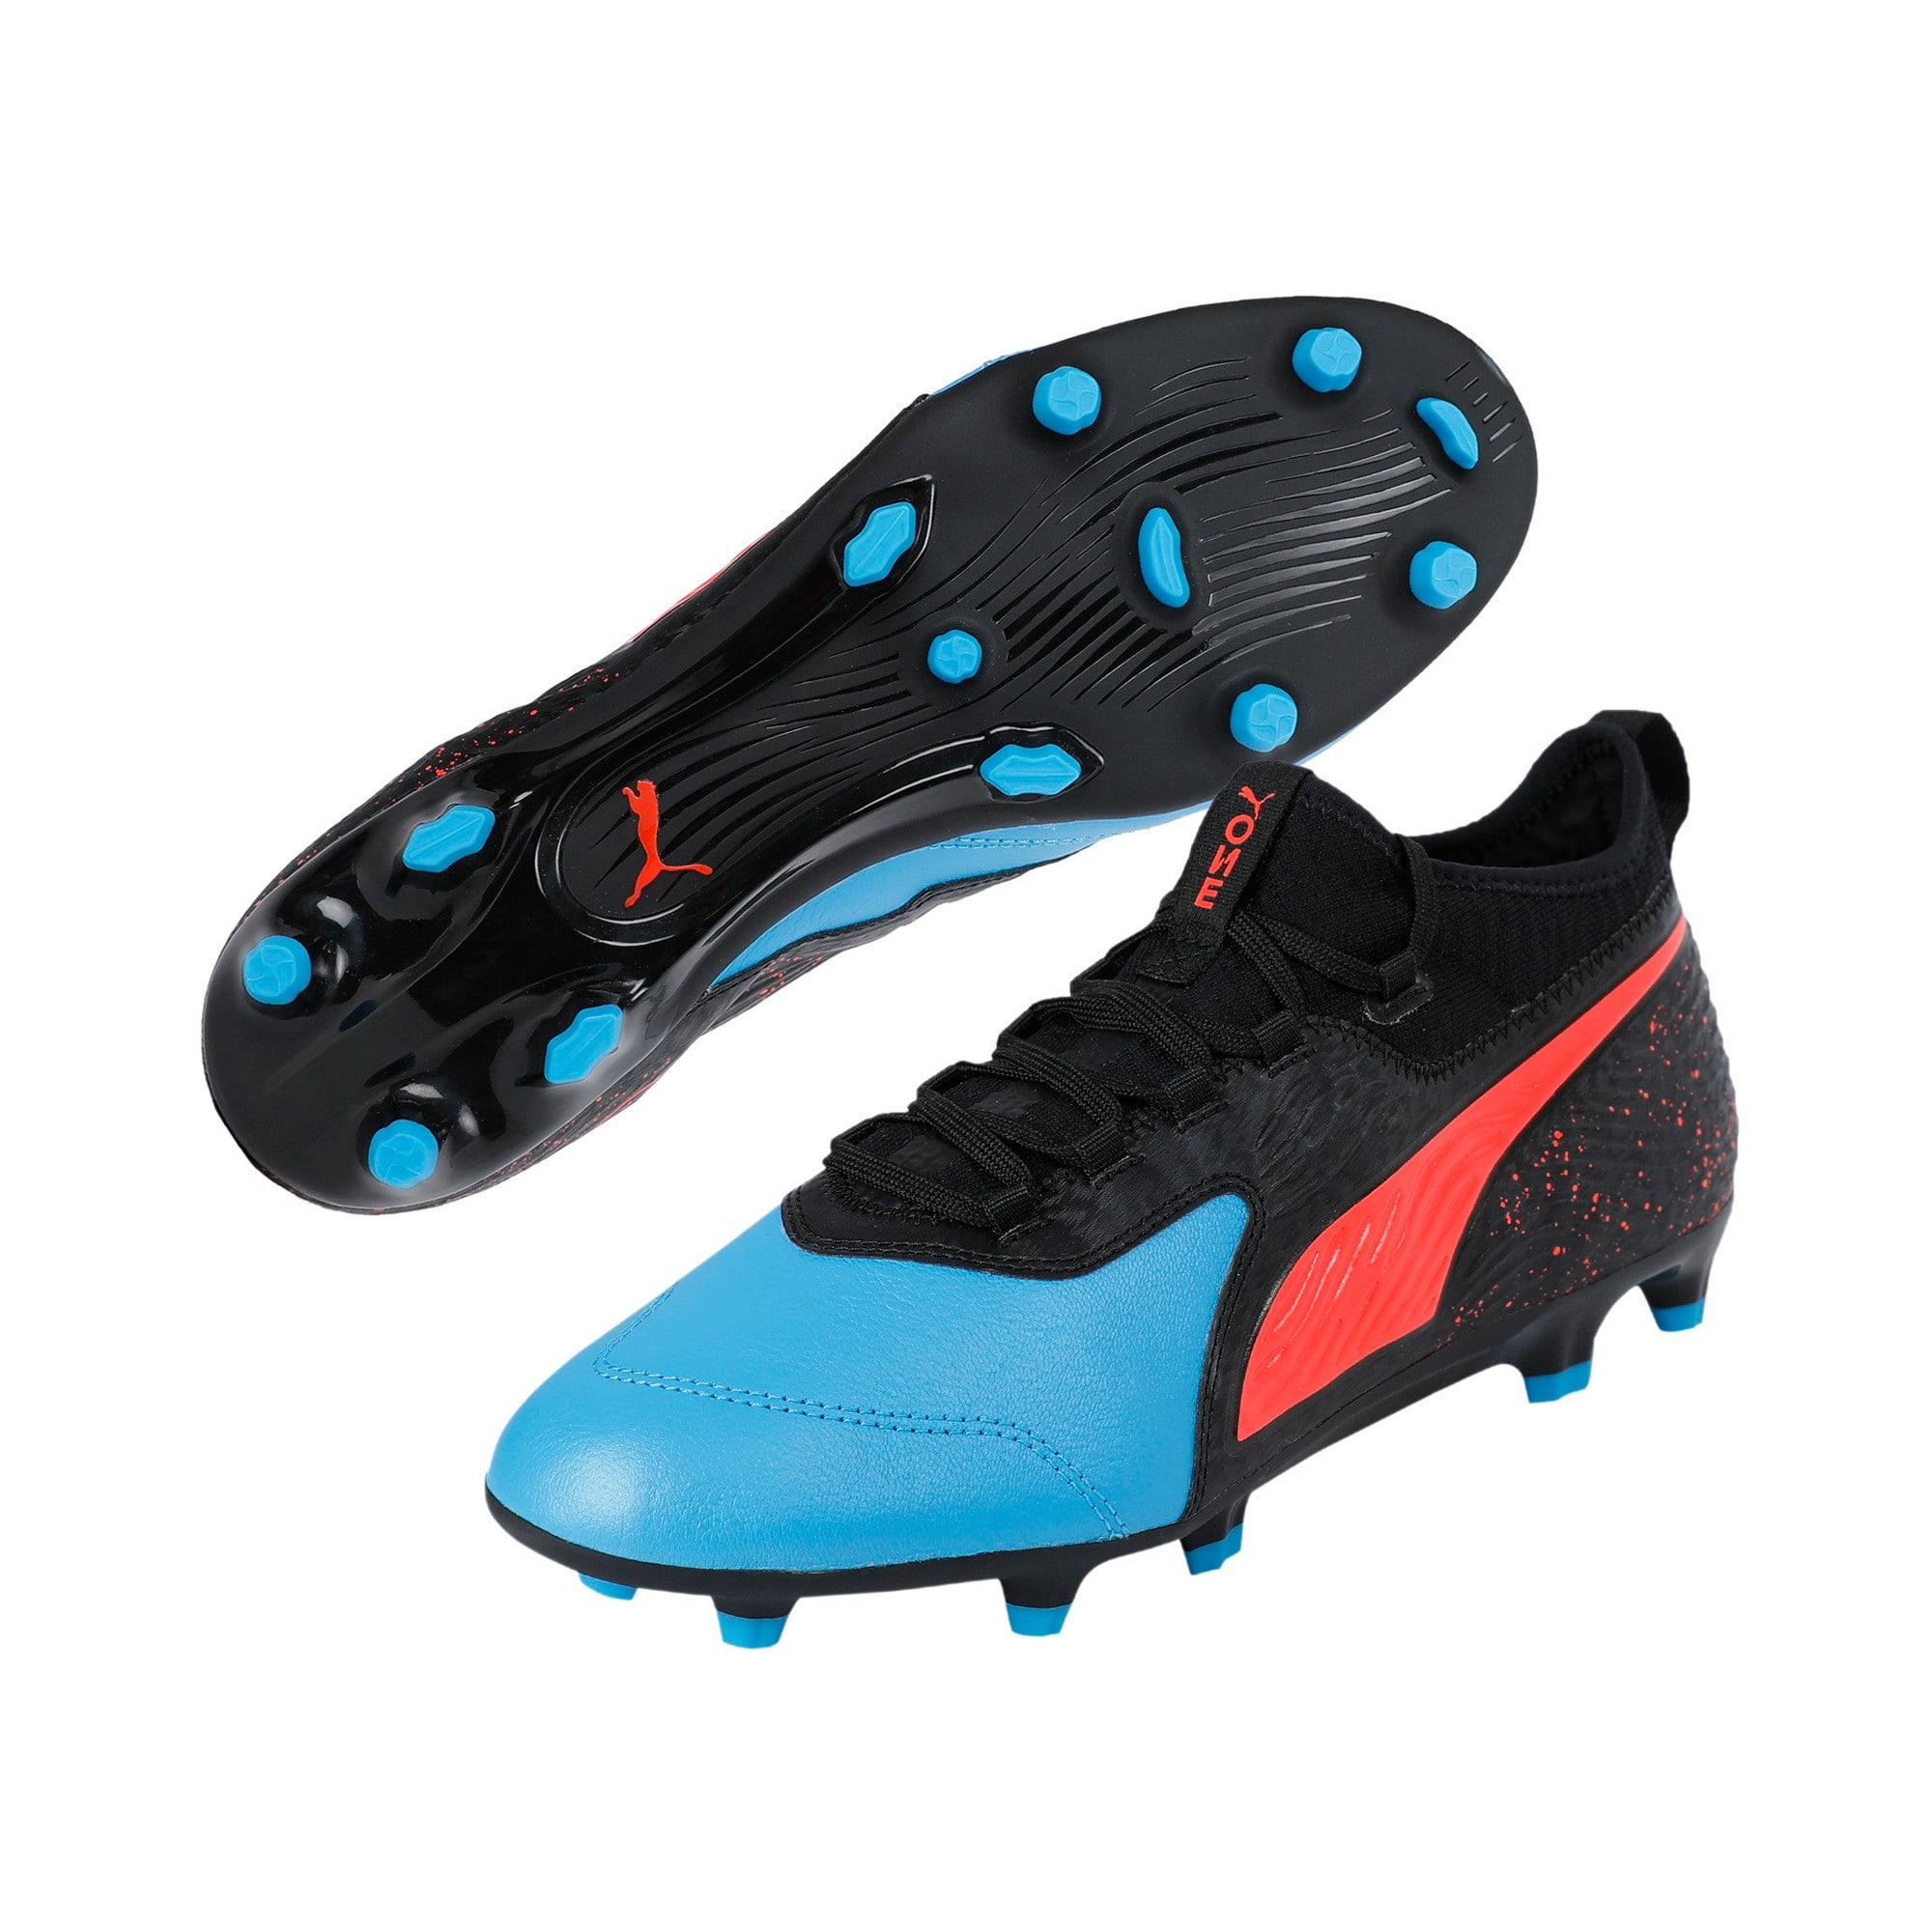 Thumbnail 2 of PUMA ONE 19.3 FG/AG Men's Football Boots, Bleu Azur-Red Blast-Black, medium-IND